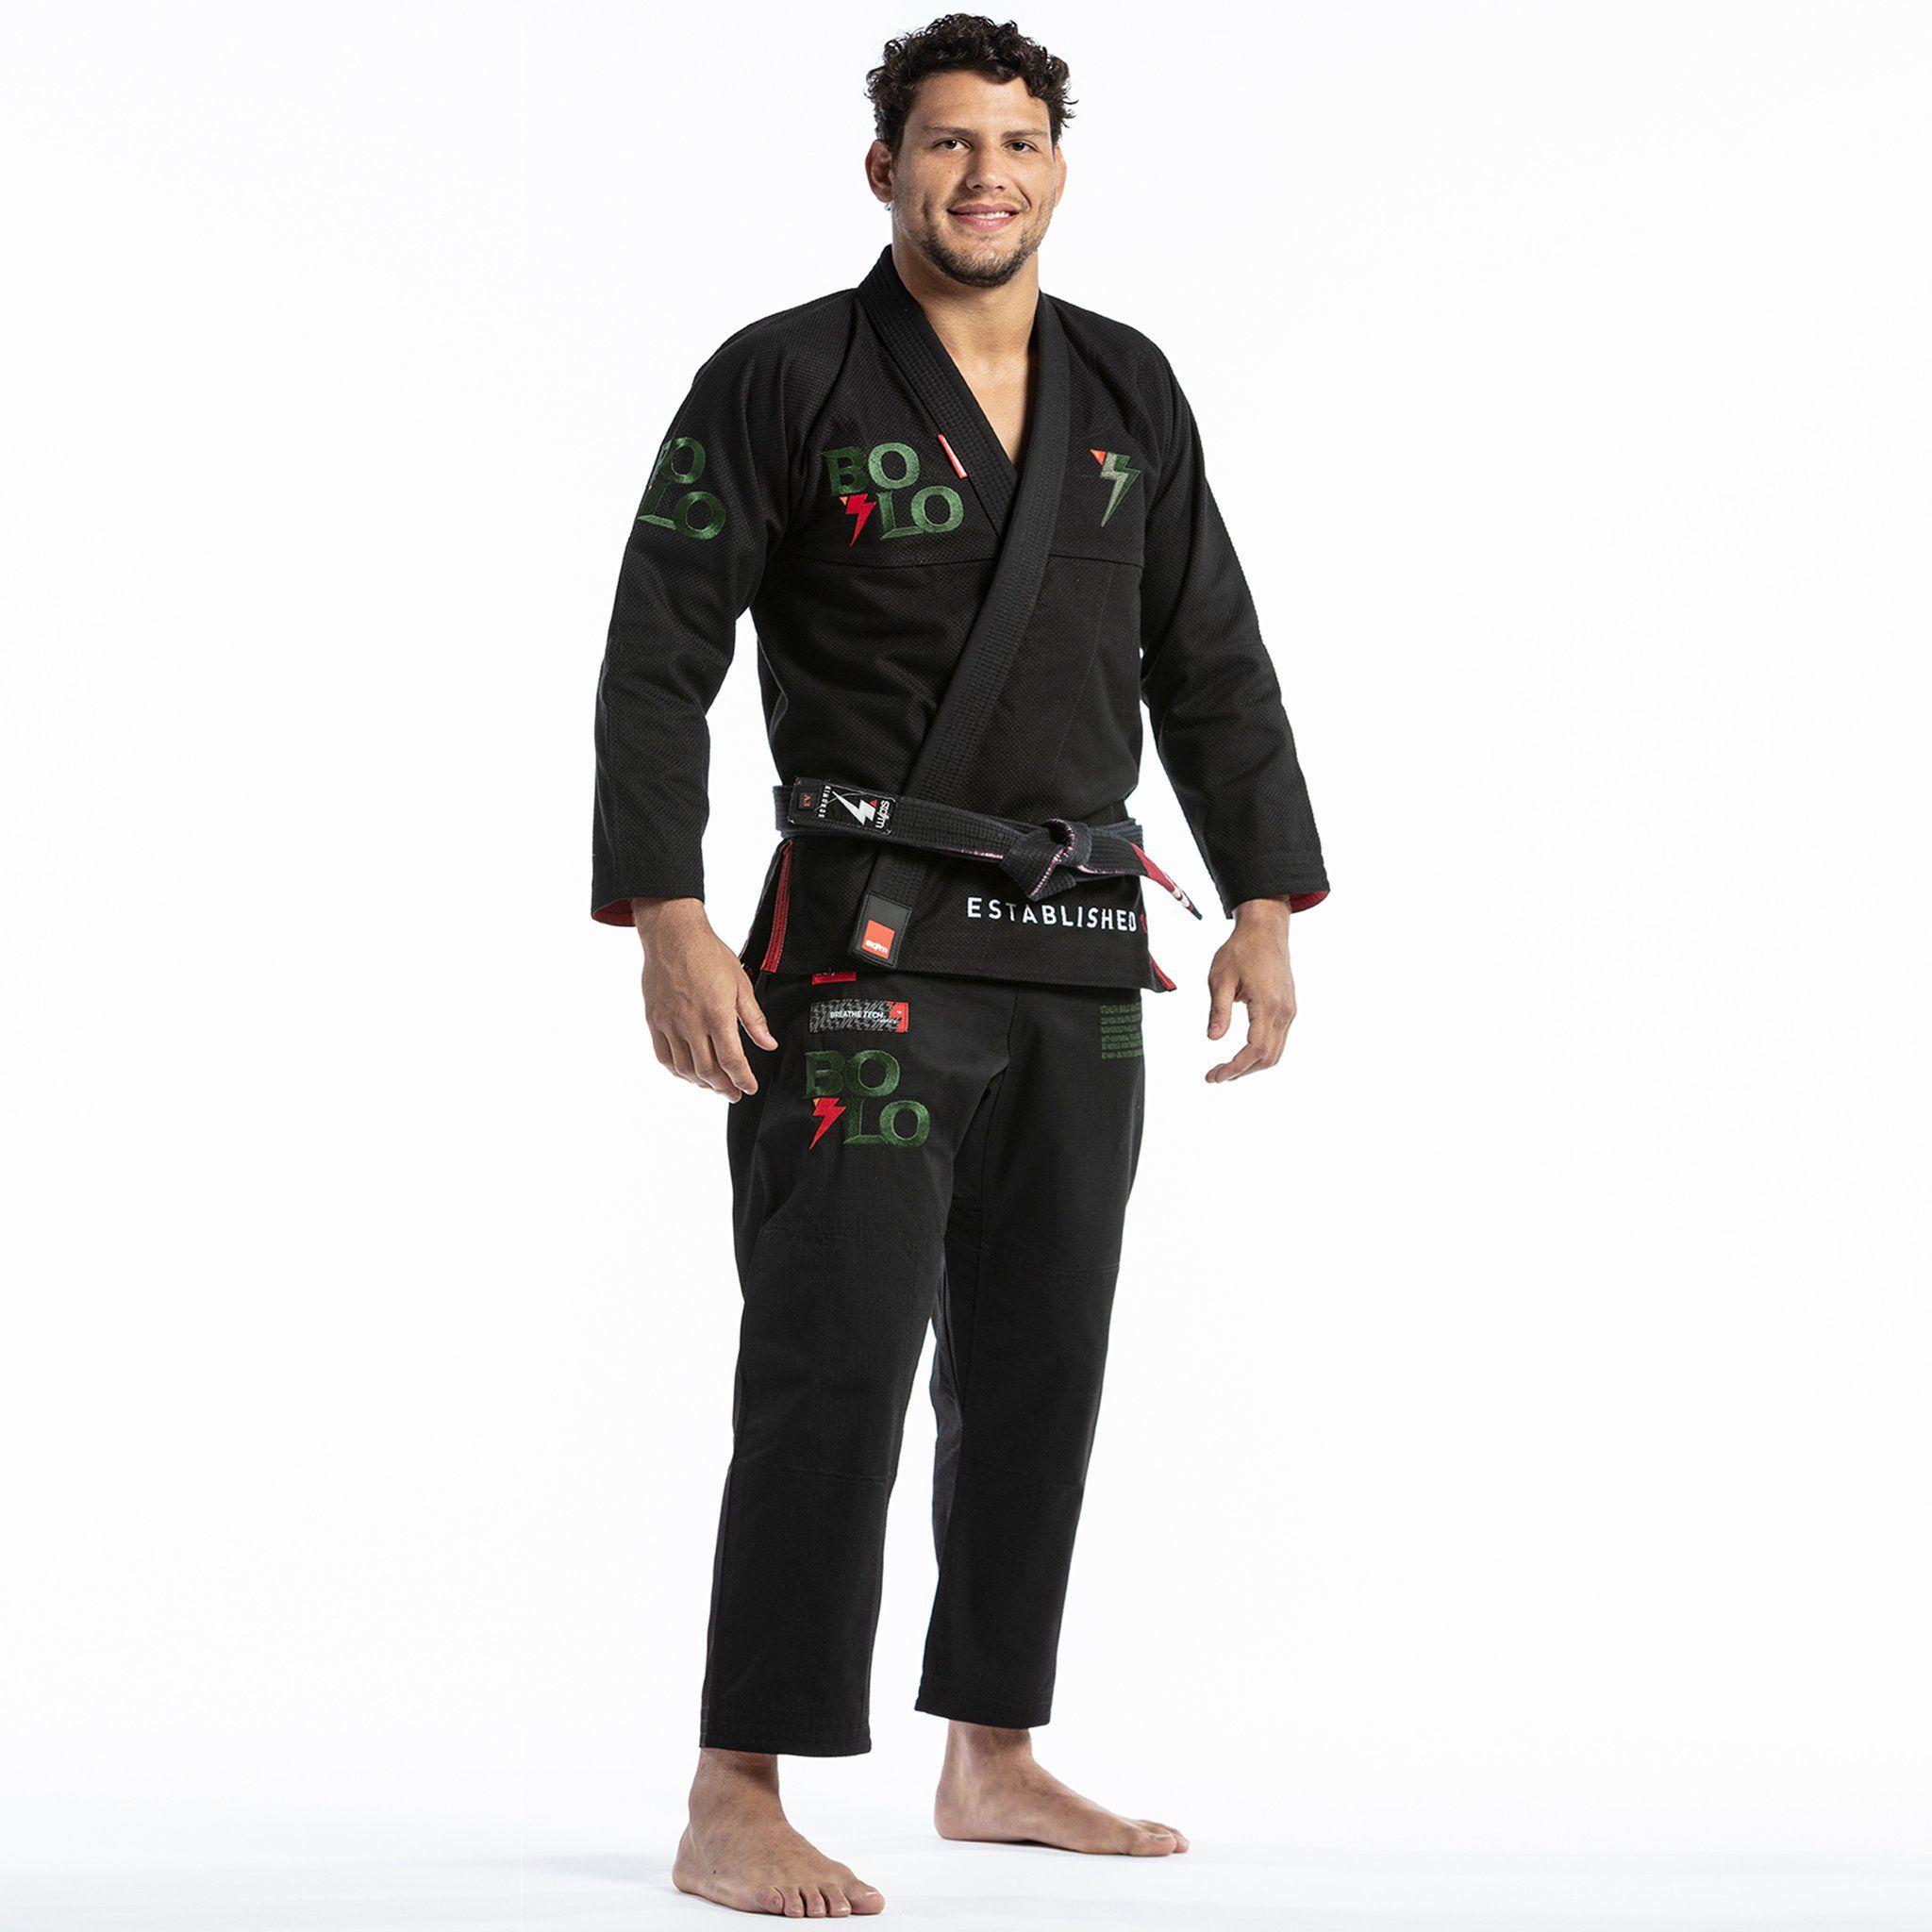 Black Jiu Jitsu Gi for Mens with Yellow Contrast Style 100/% Cotton Pearl Weave